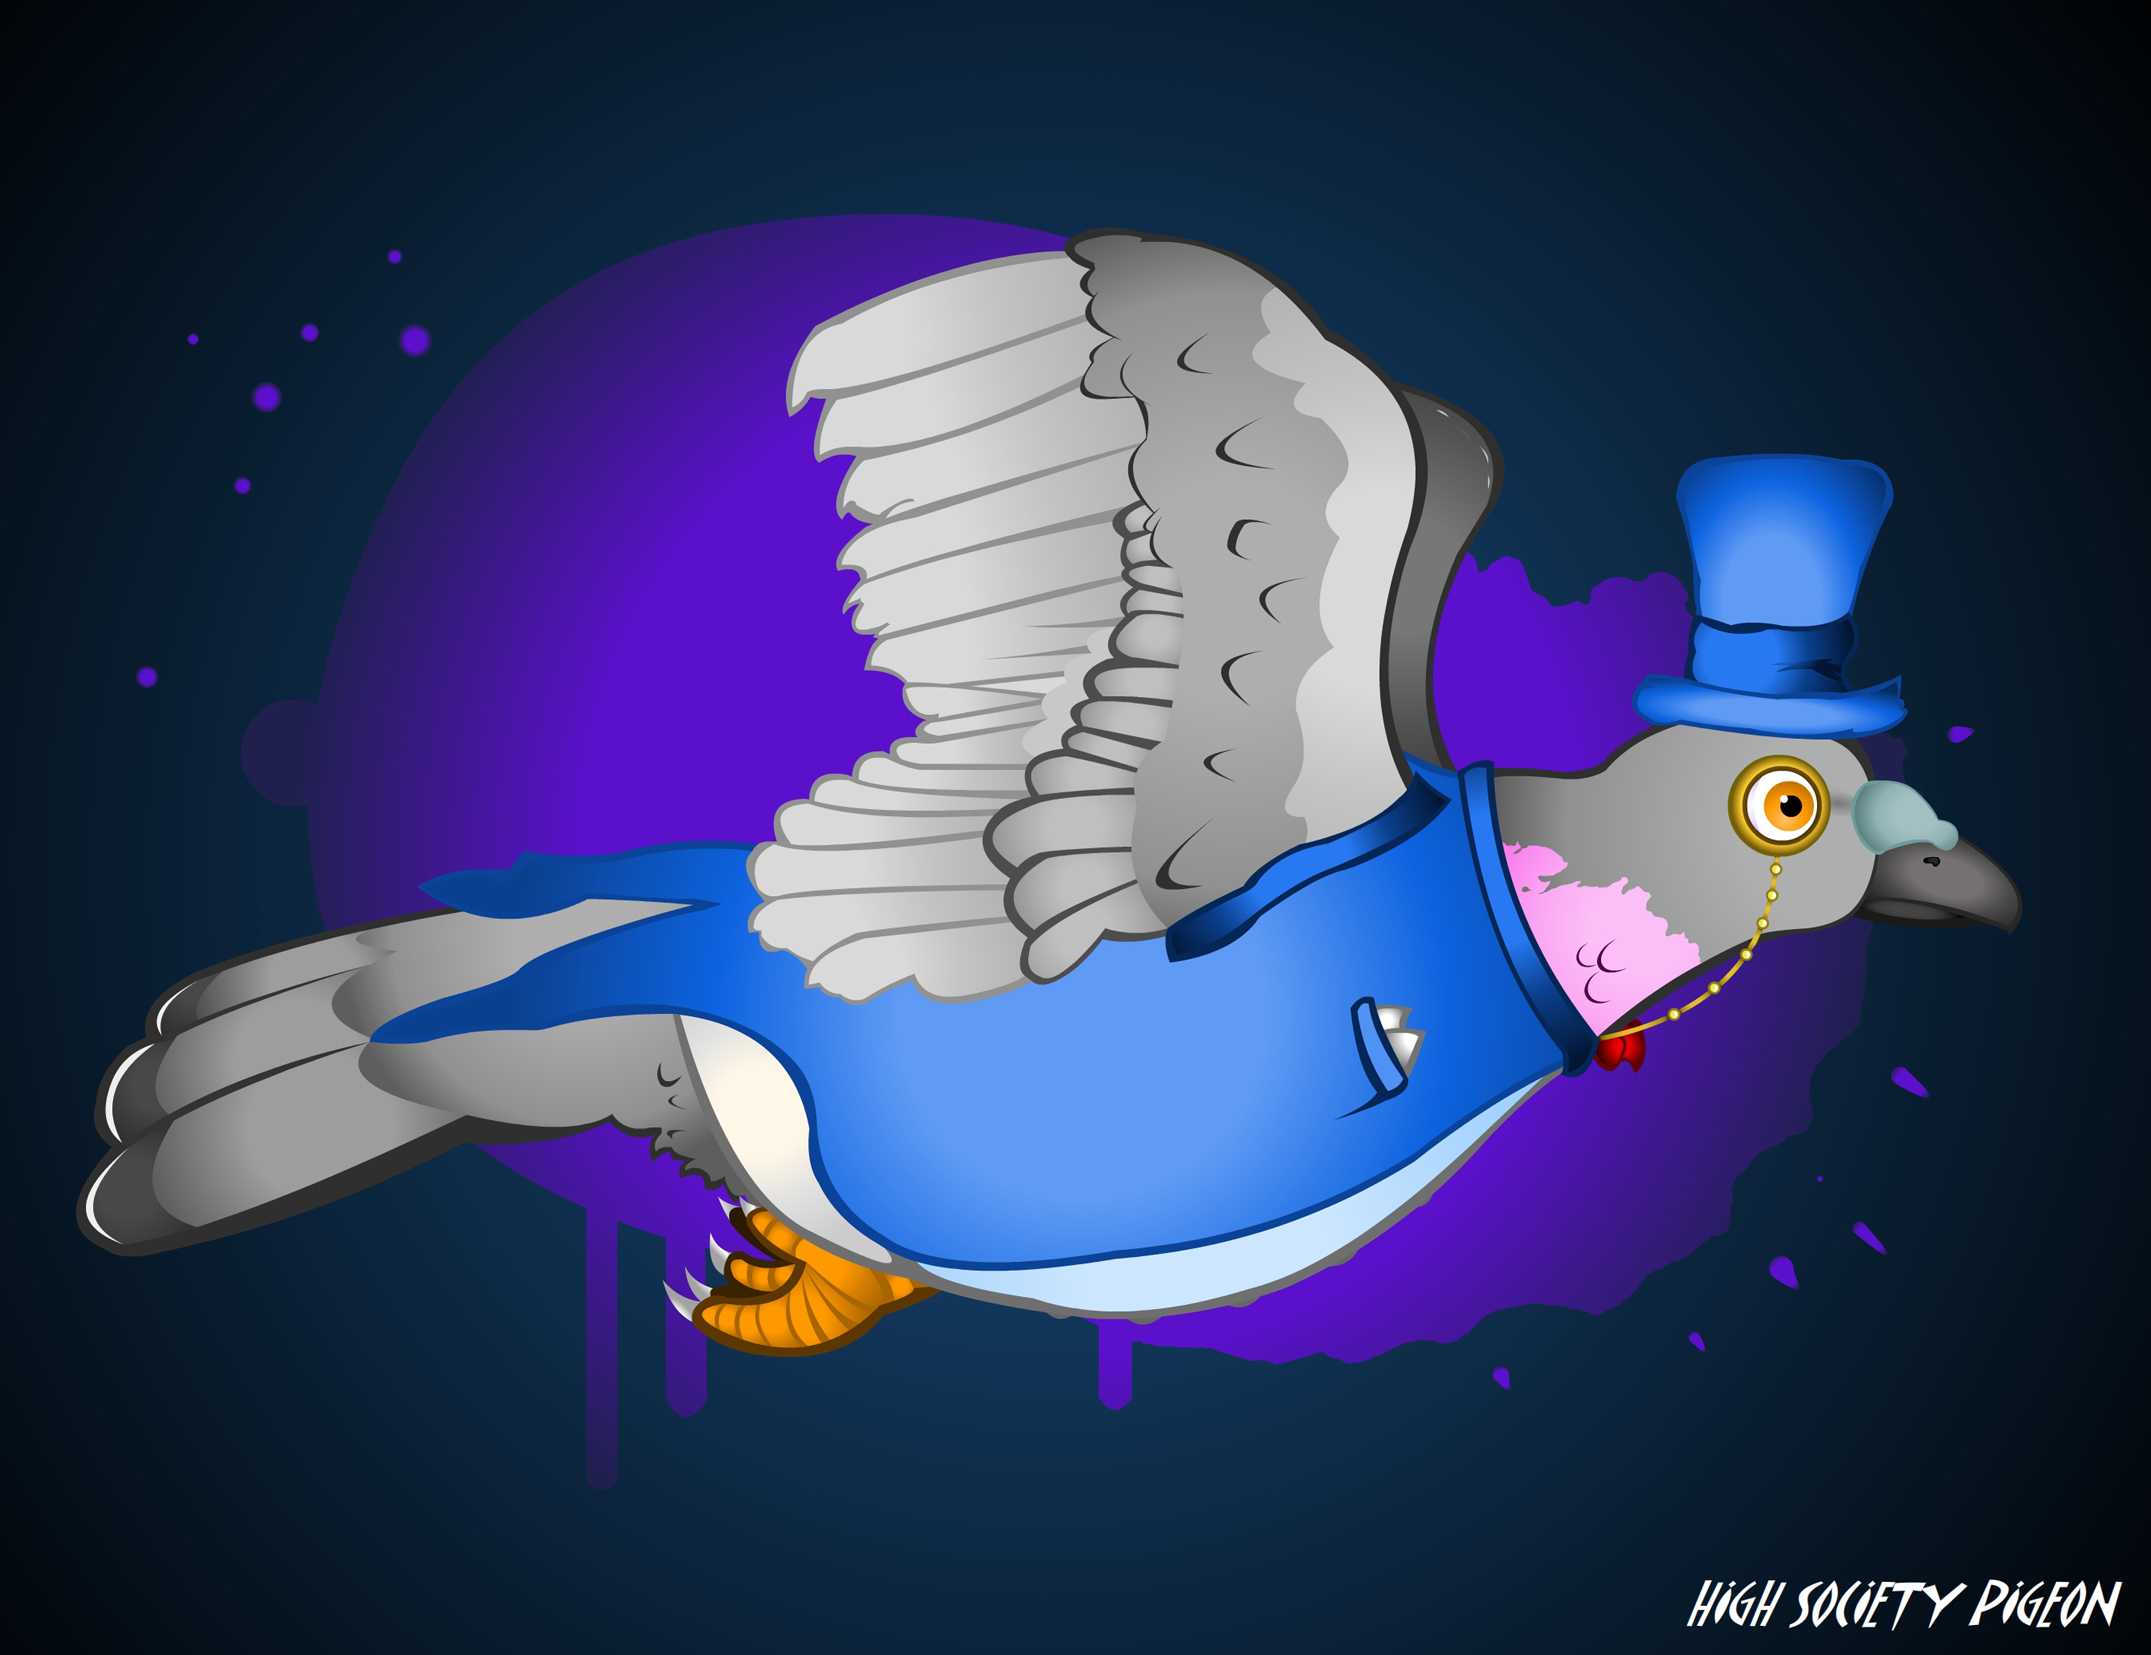 High Society Pigeon